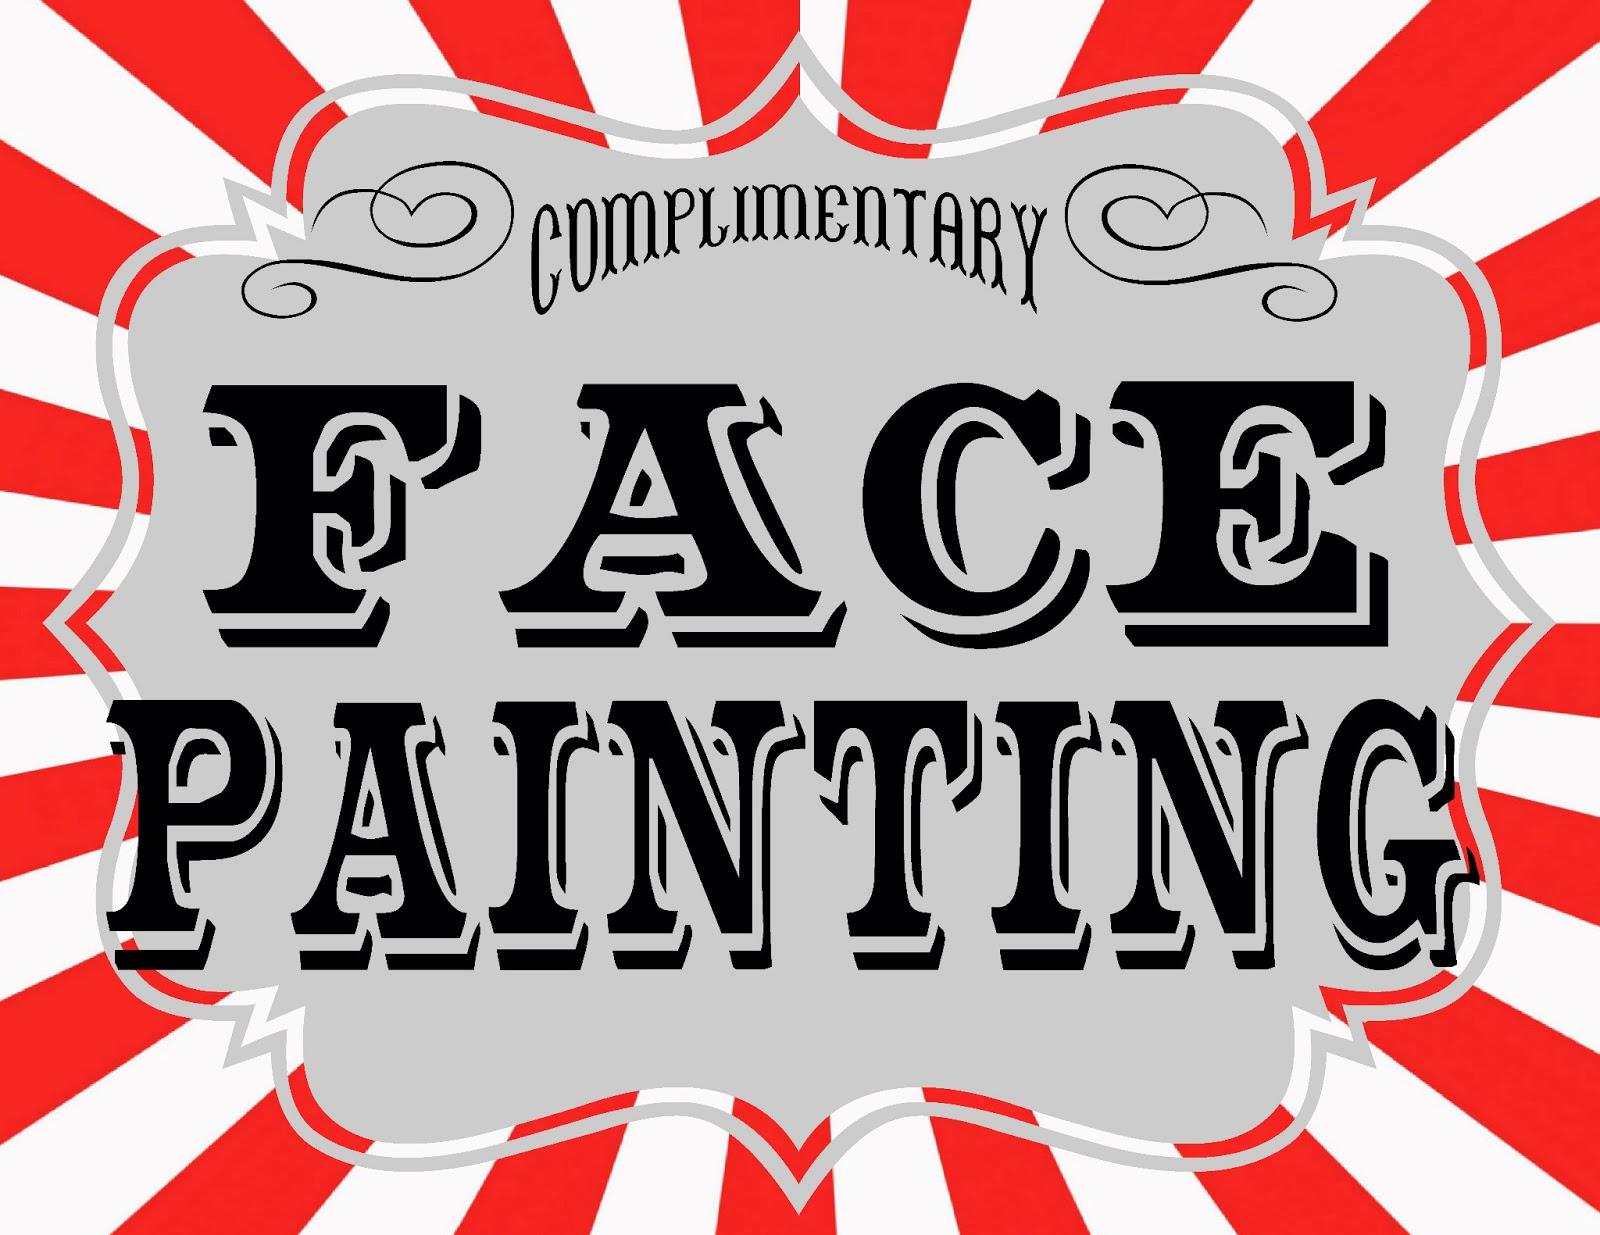 face painting clipart [ 1600 x 1235 Pixel ]